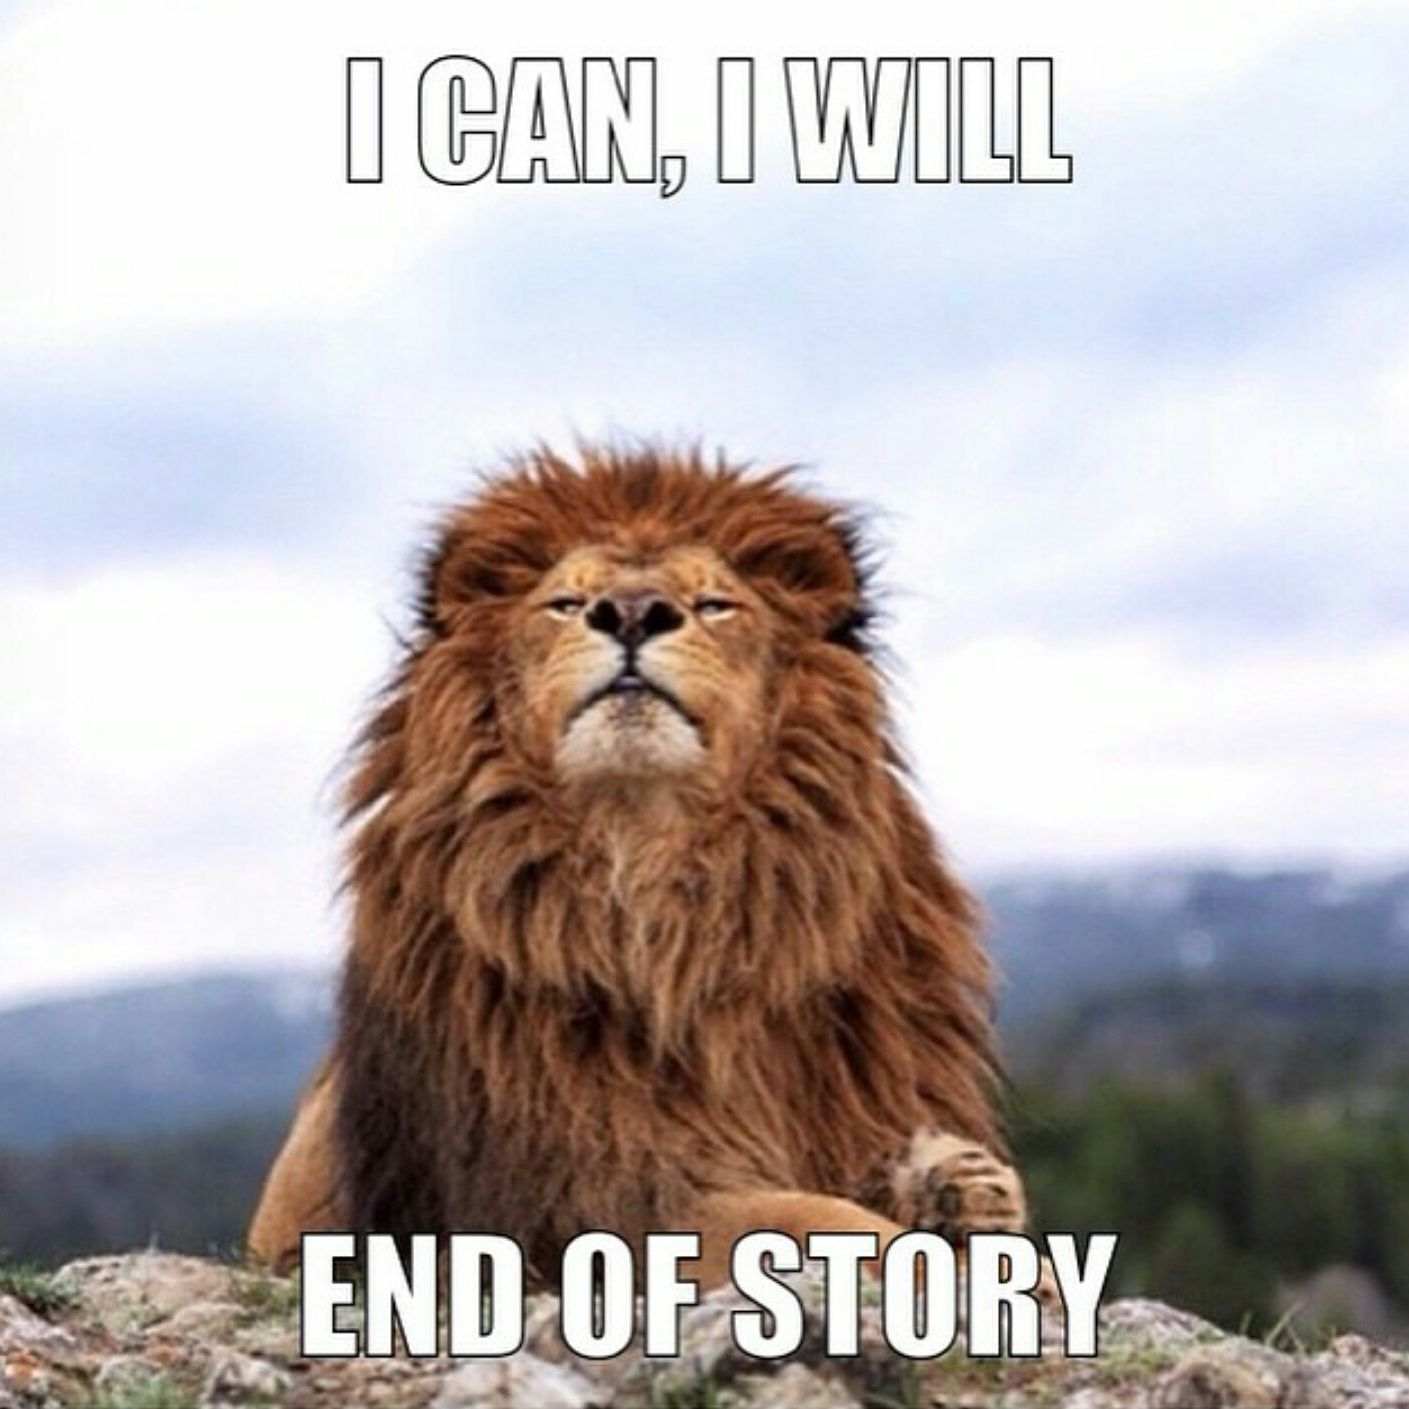 Determined Warrior Quotes Success Quotes Lion Quotes